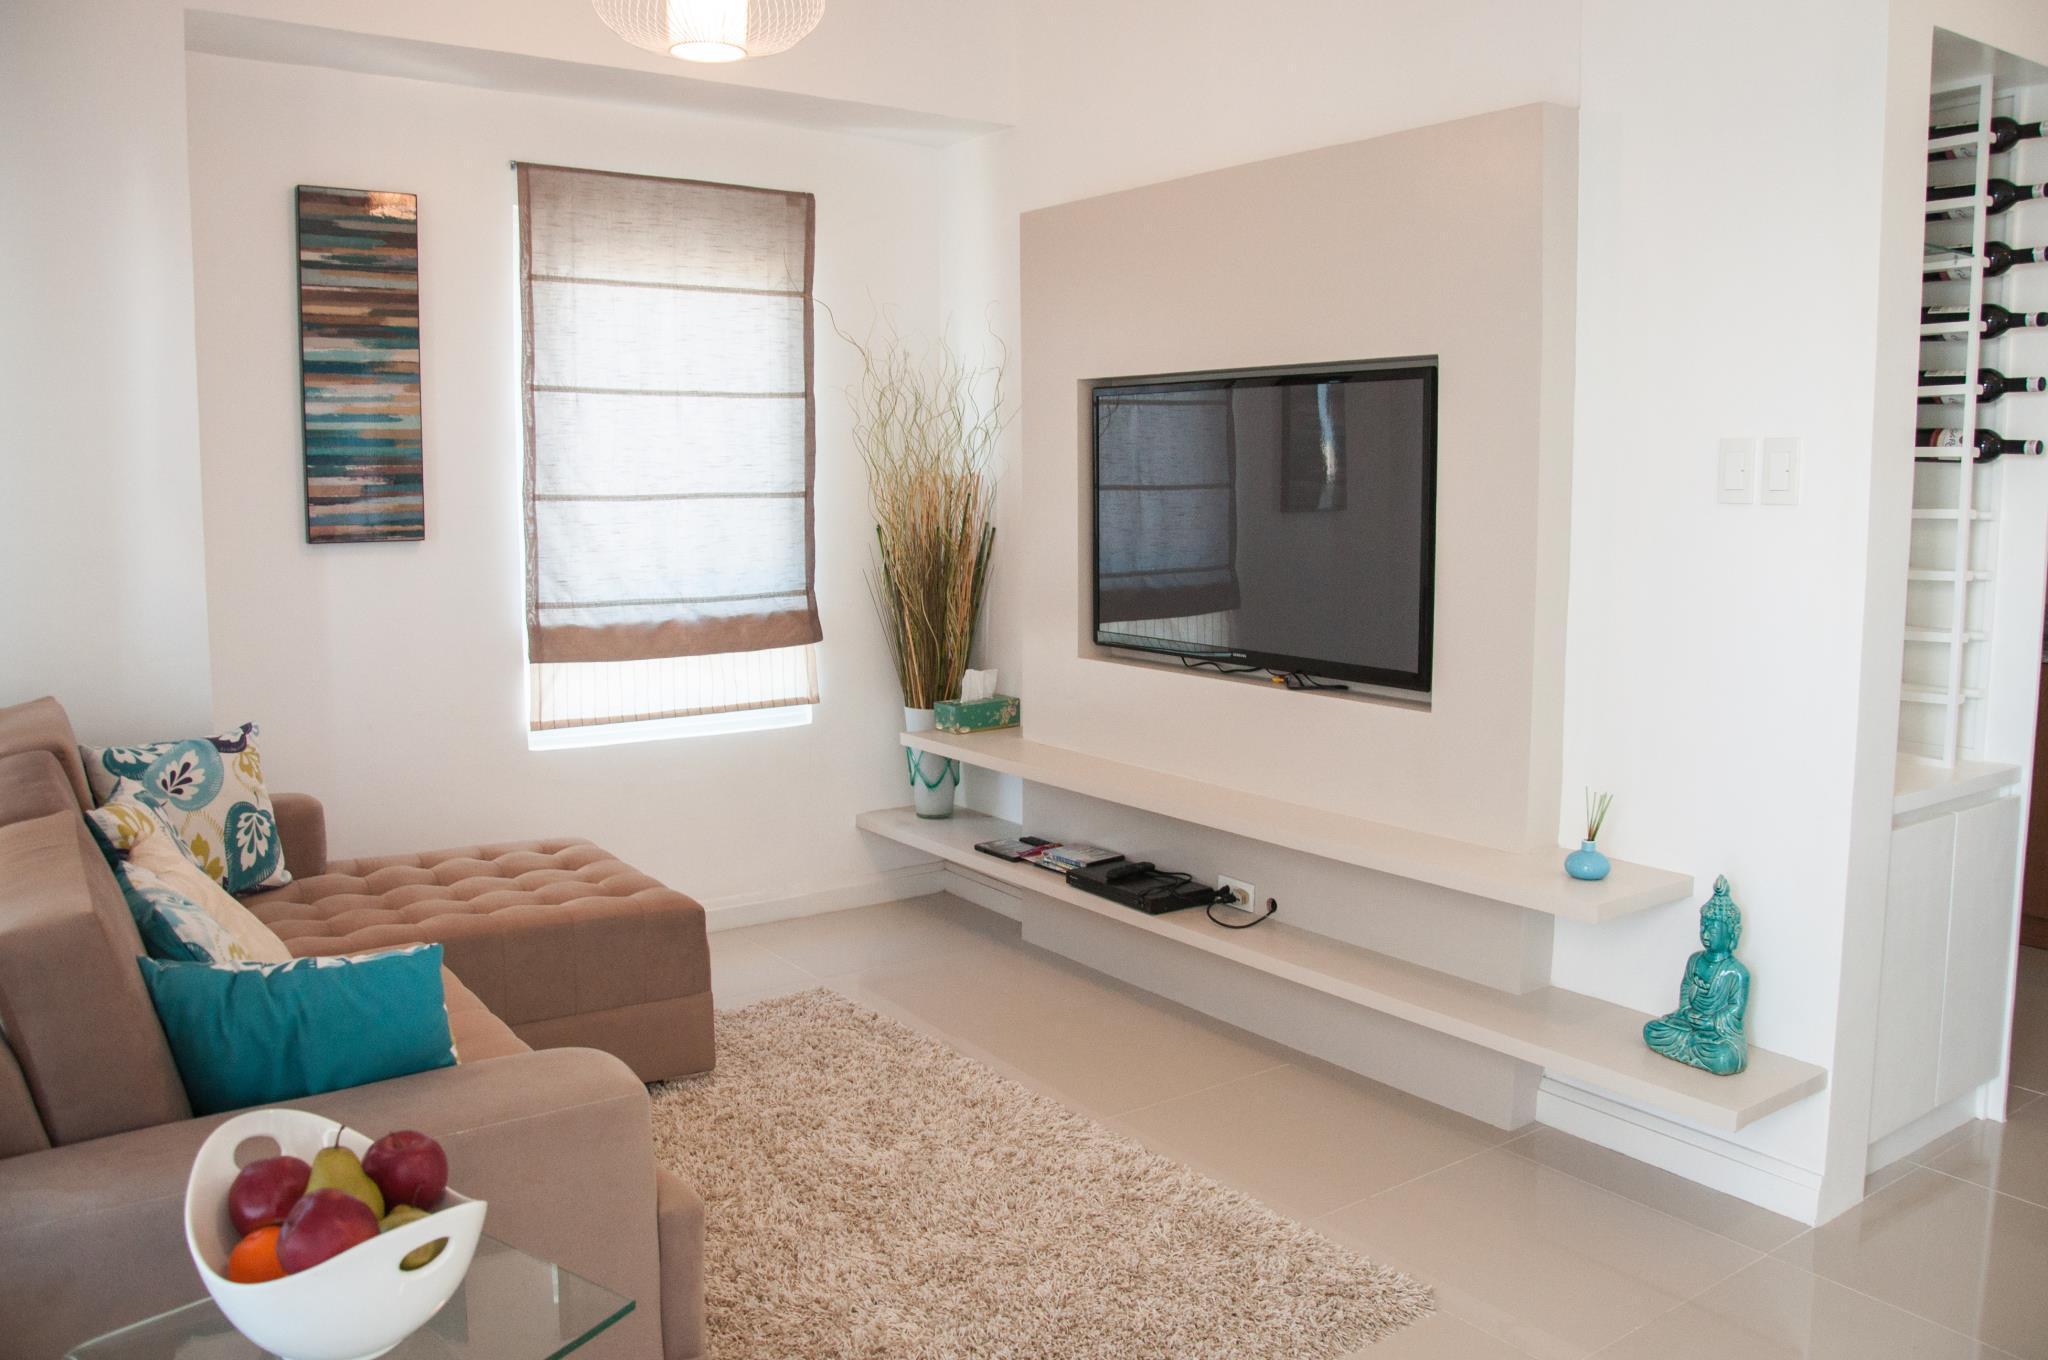 Mactan Island Luxury 1 Bedroom Apartment A